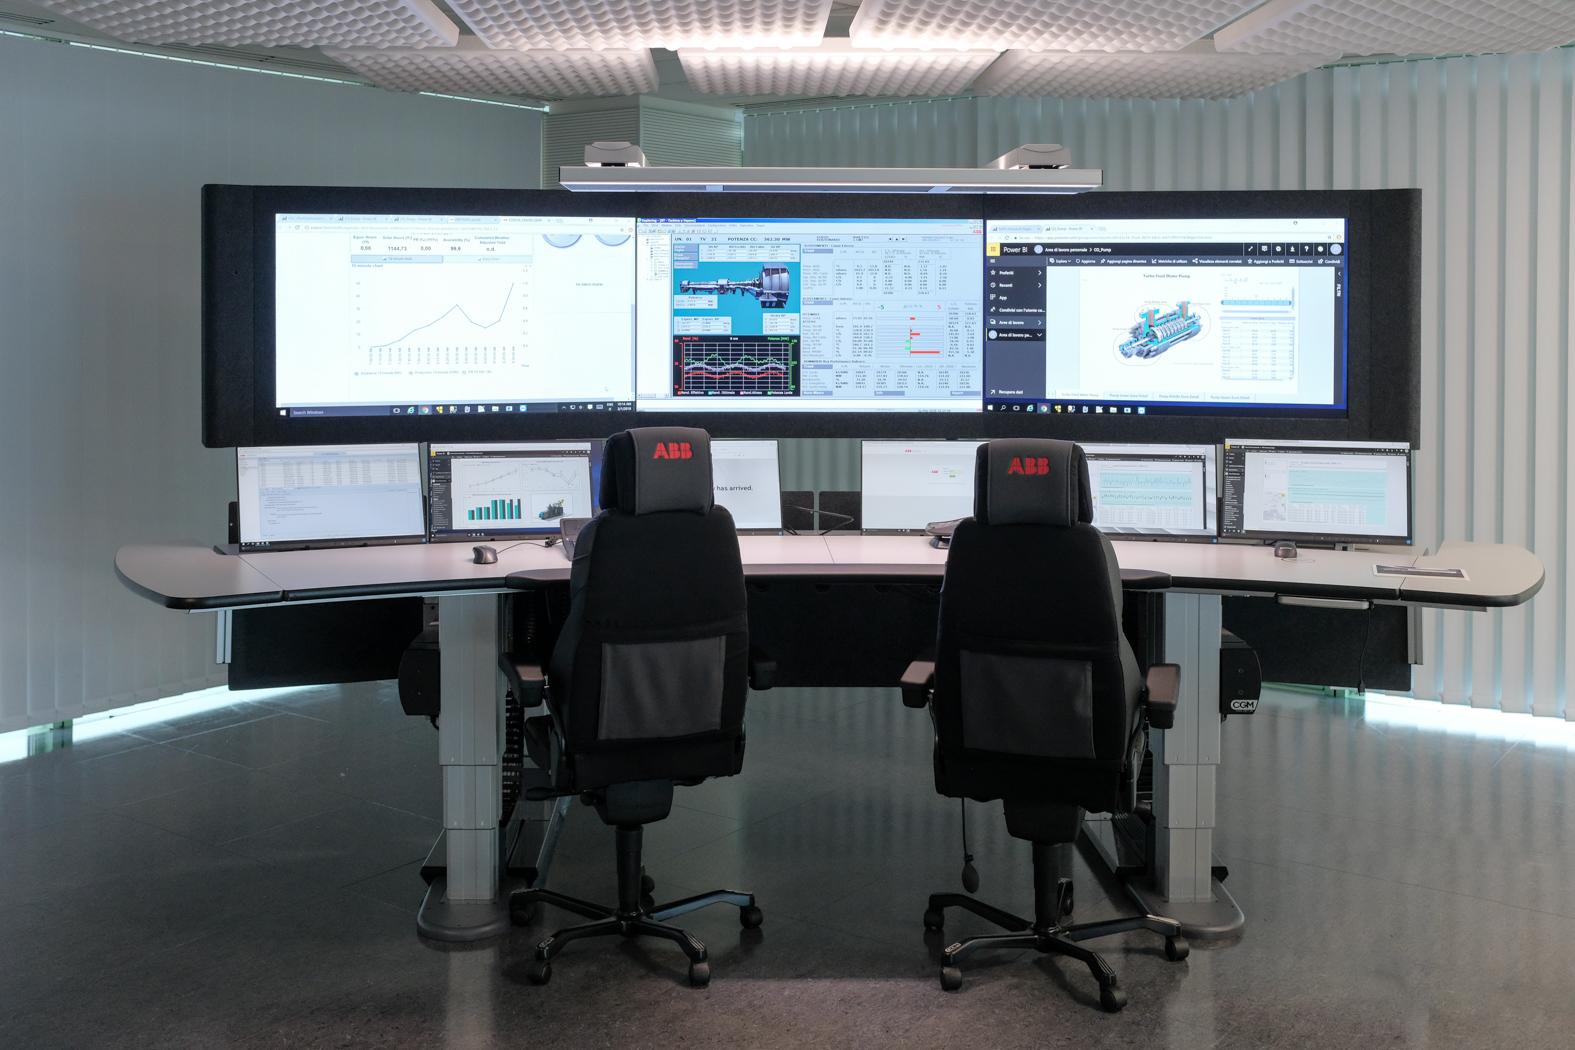 ABB Ability Collaborative Operation Center, Genoa, Italy.